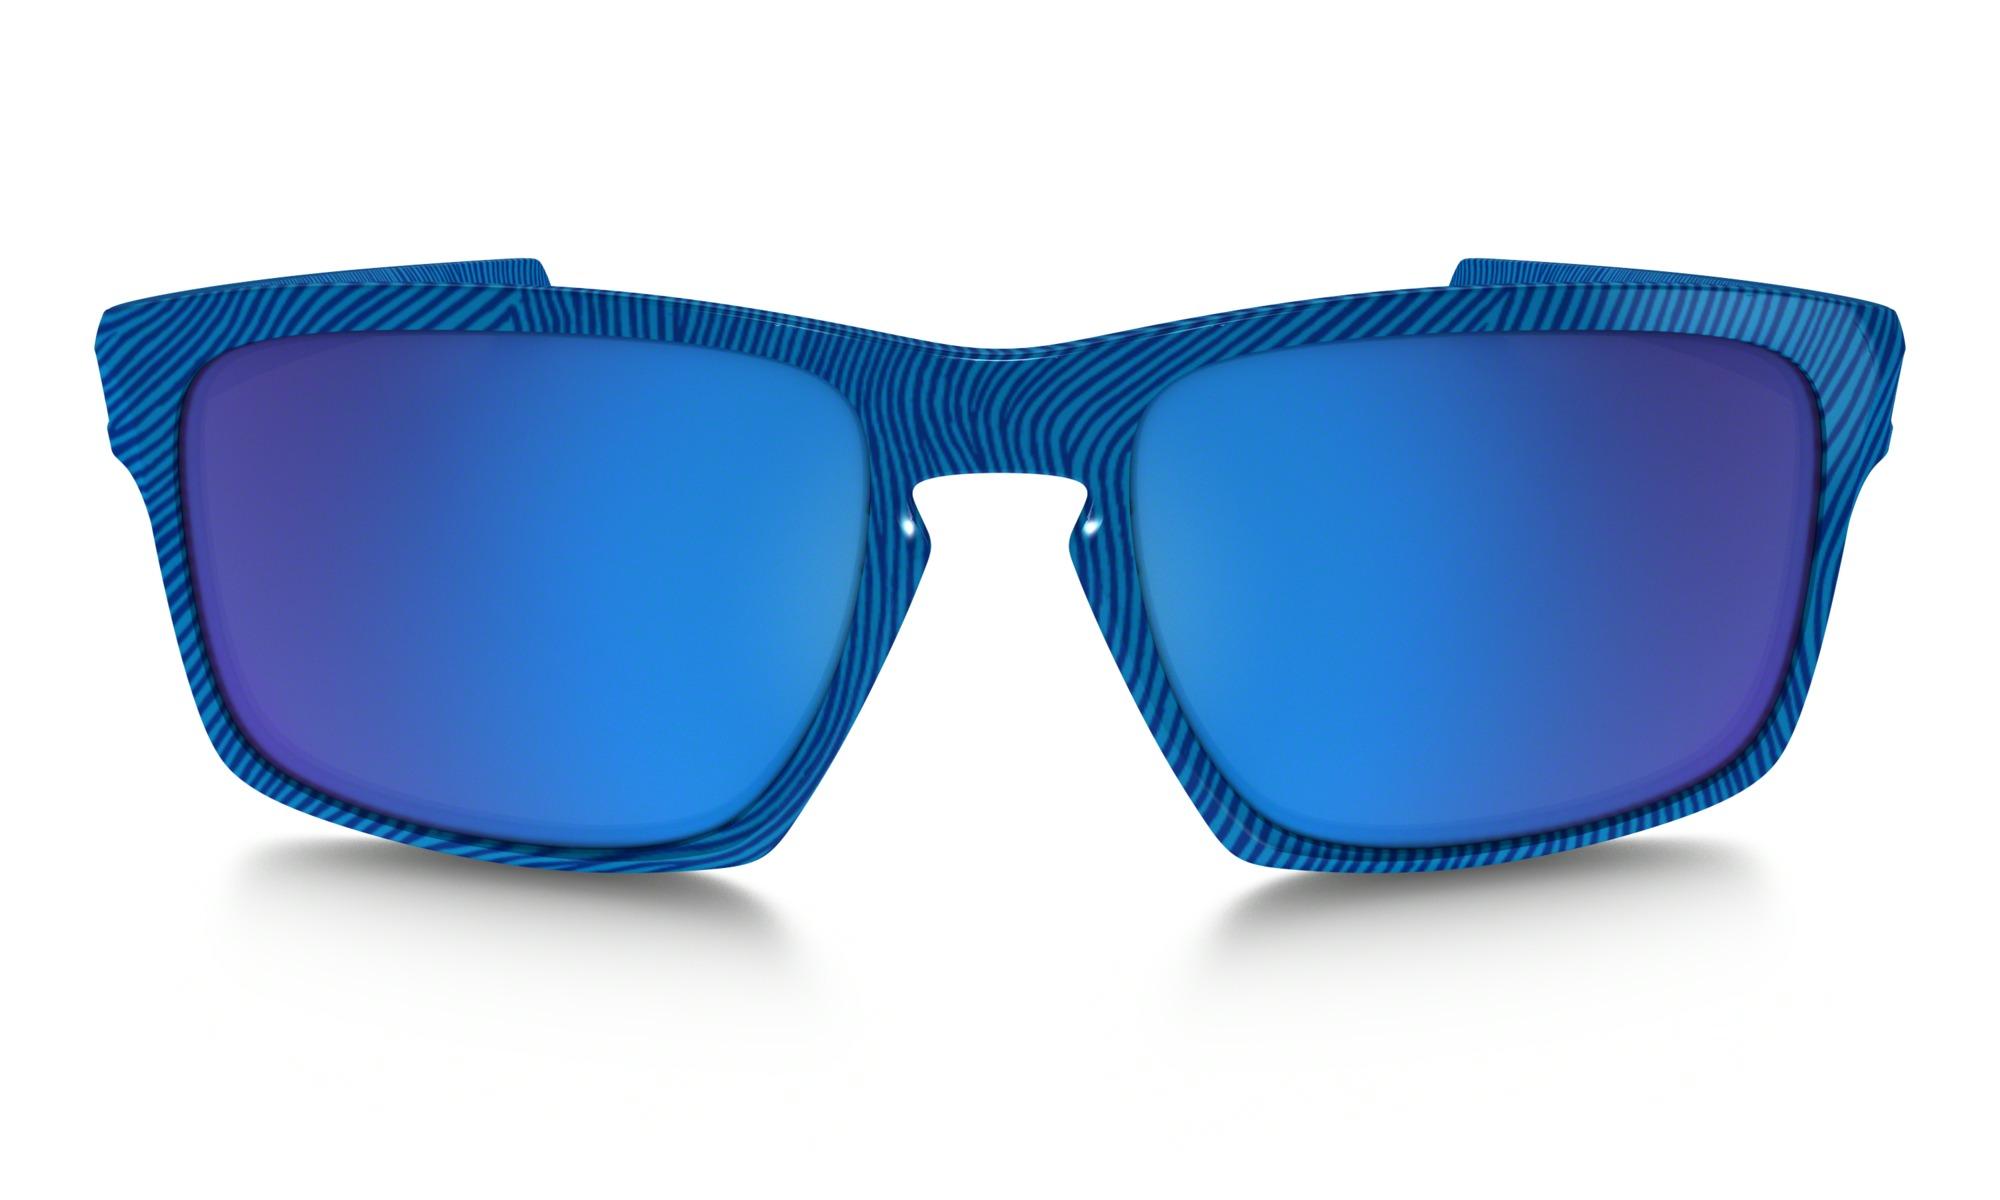 87b6a2108b Oakley Beach Volleyball Glasses « Heritage Malta